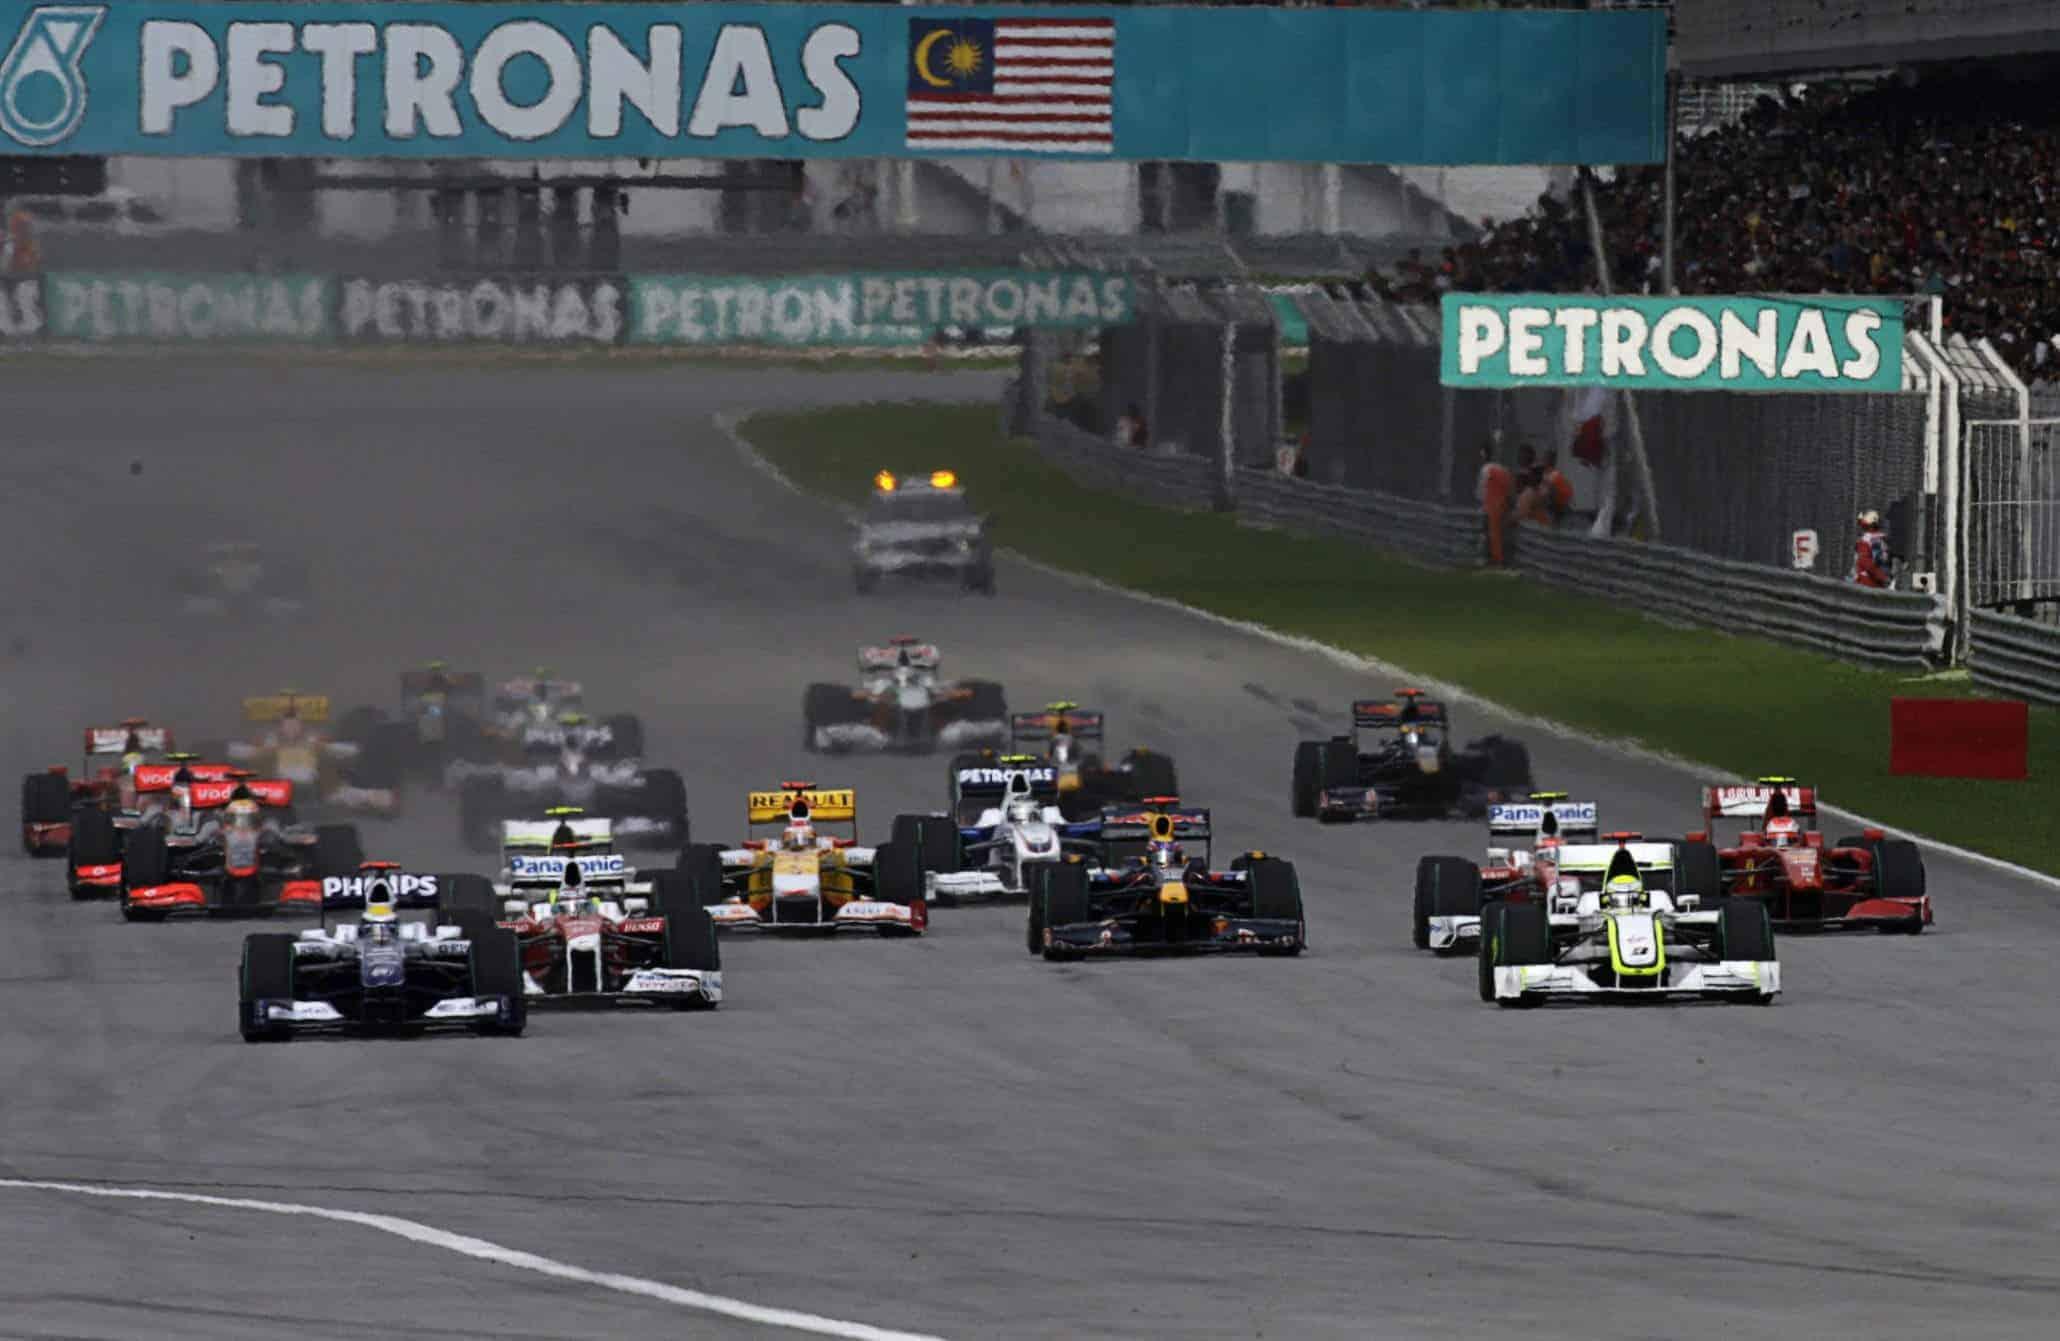 2009 Malaysian GP start Photo Red Bull